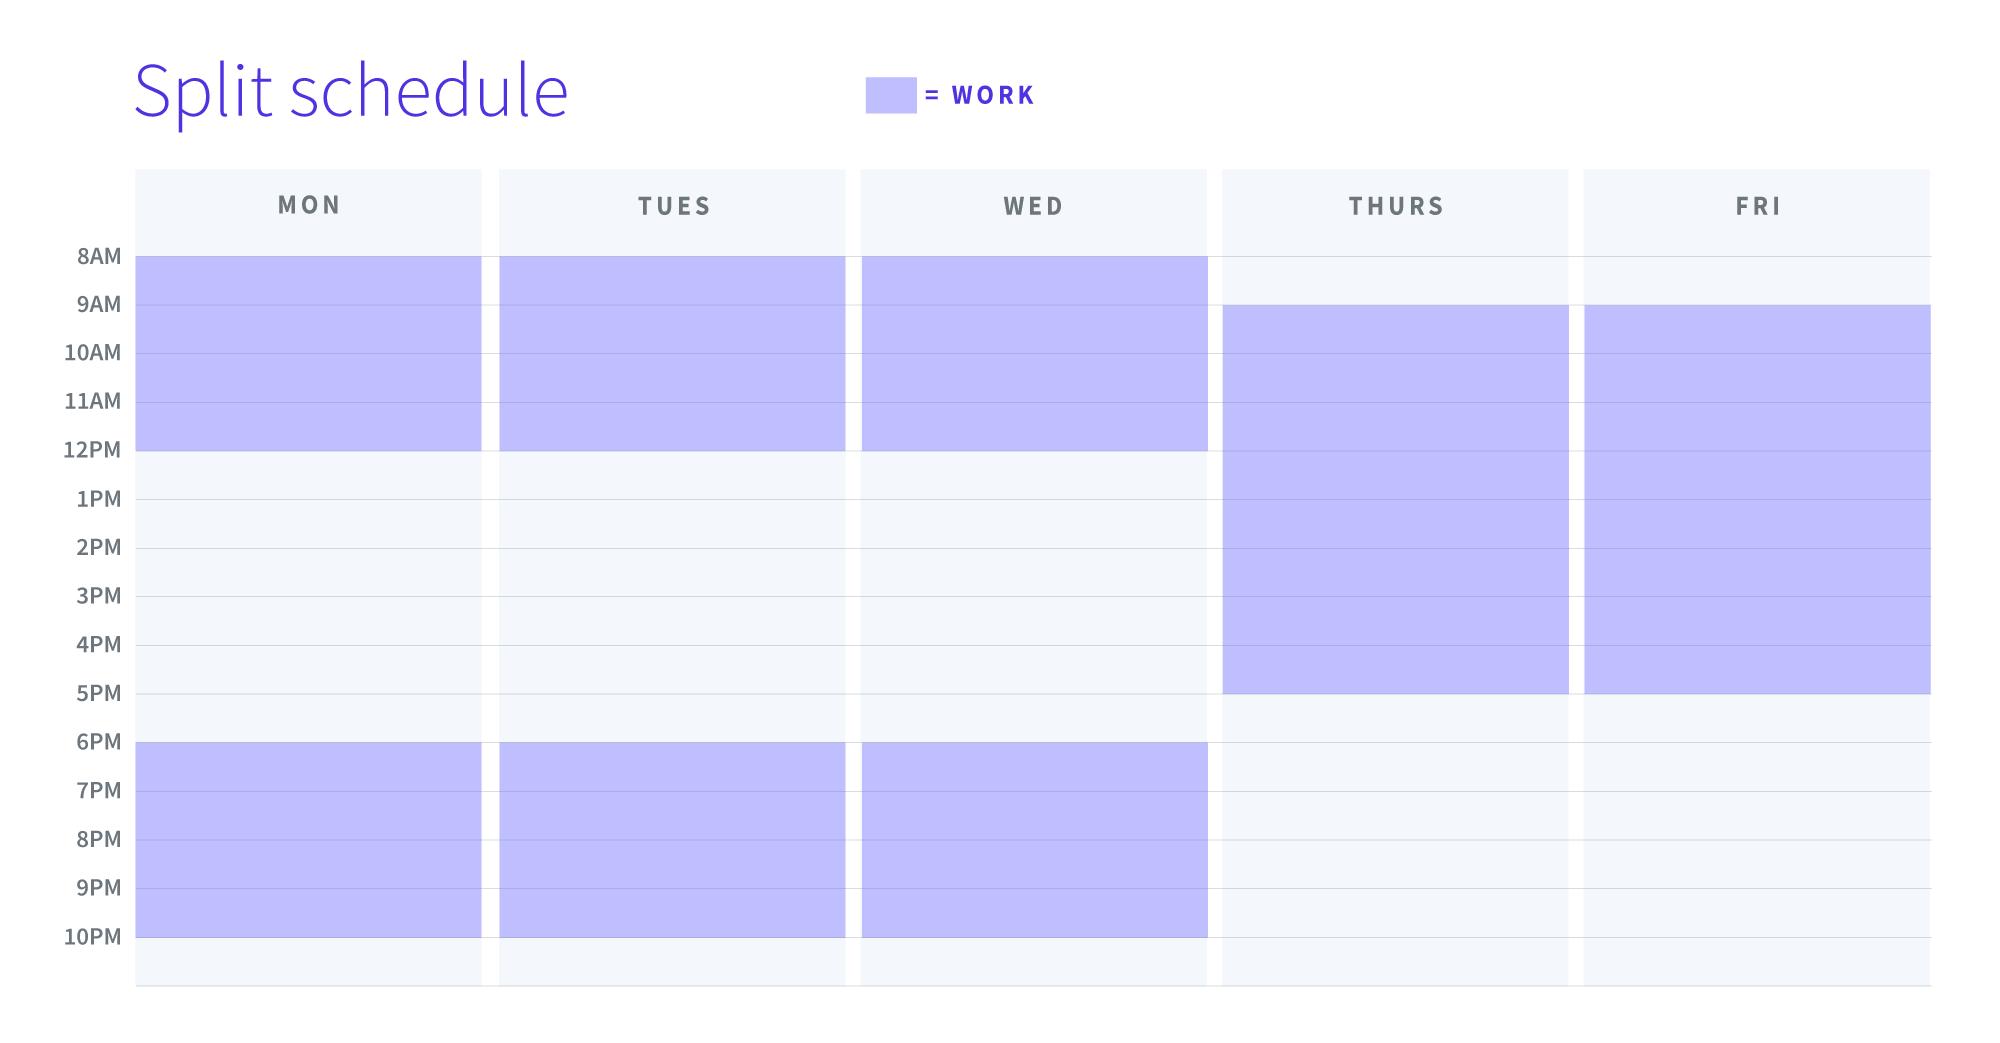 Split schedule graphic